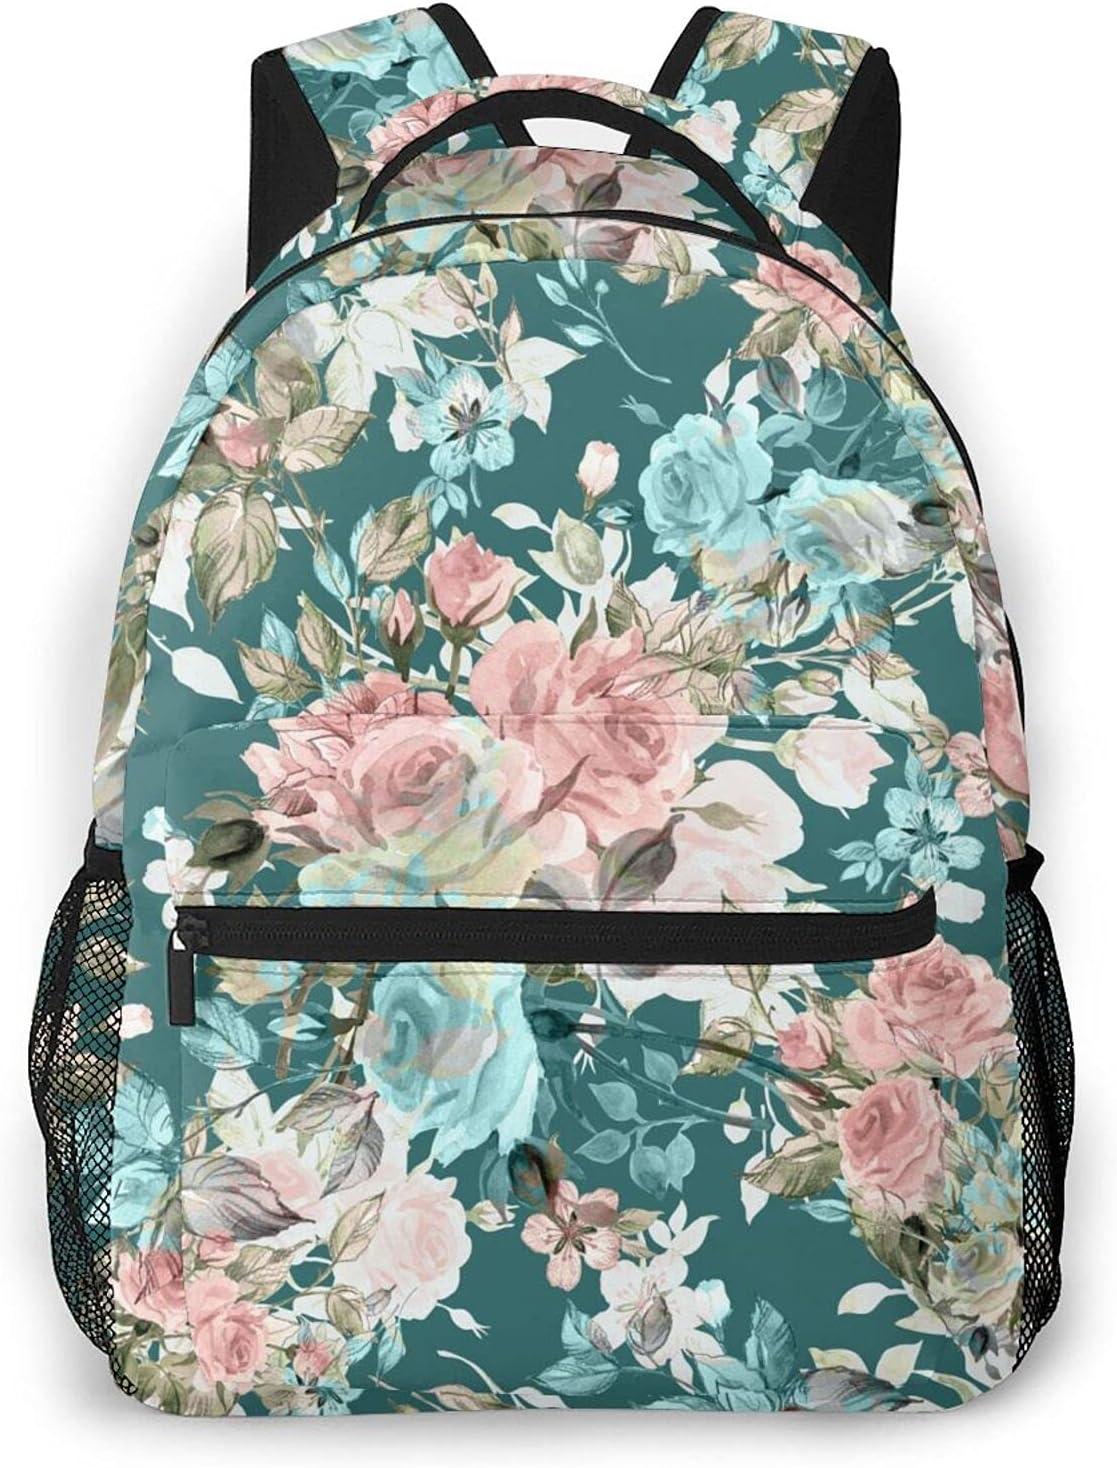 Lightweight Water Resistant Peony New York Mall Backpack Change Gradual Dallas Mall Design